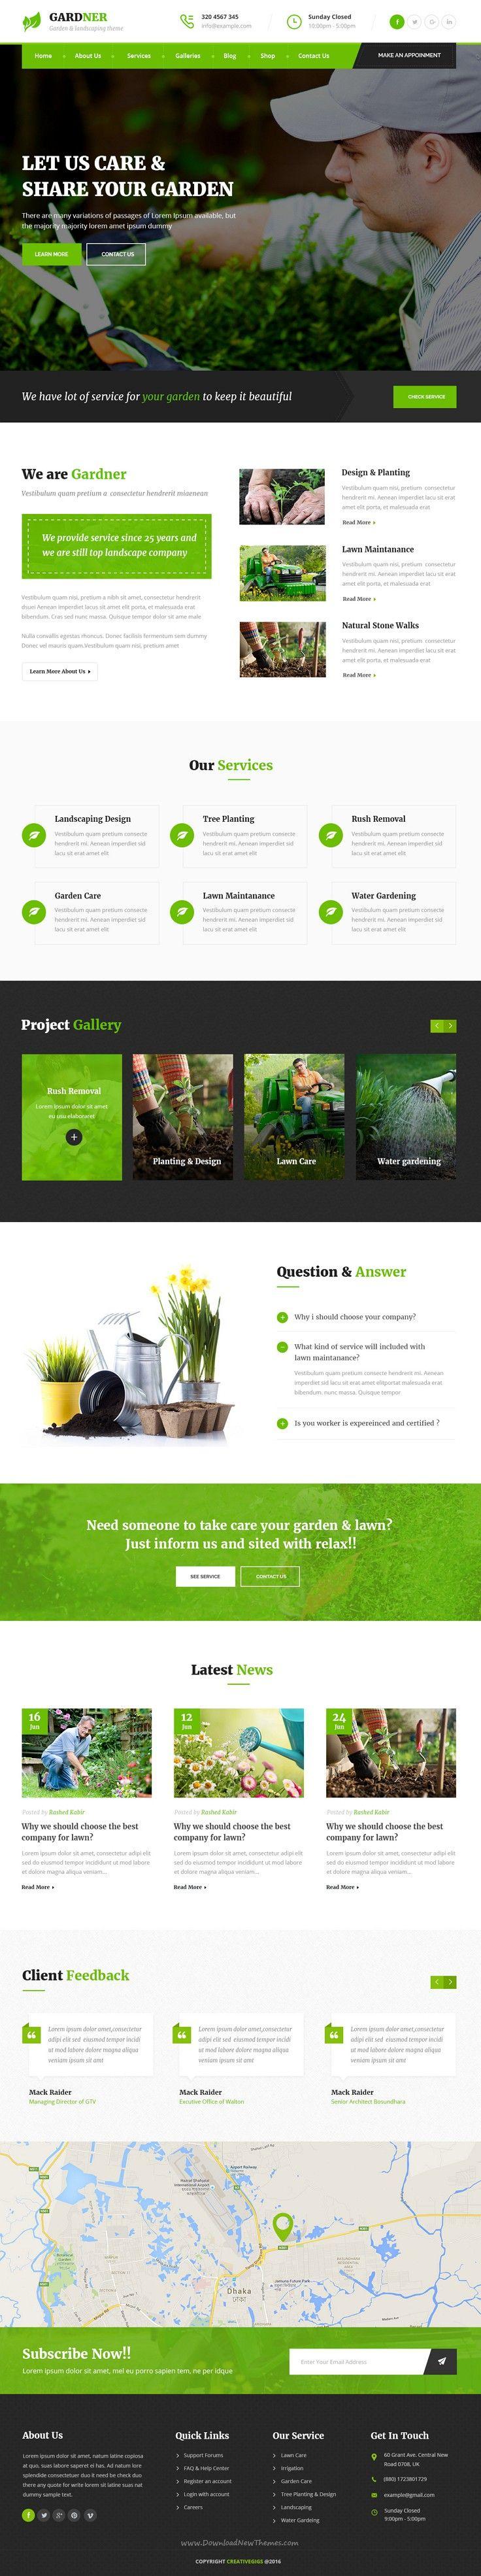 Gardner Garden Landscaping Psd Template Beautiful Website Design Website Design Layout Lawn Care Business Cards